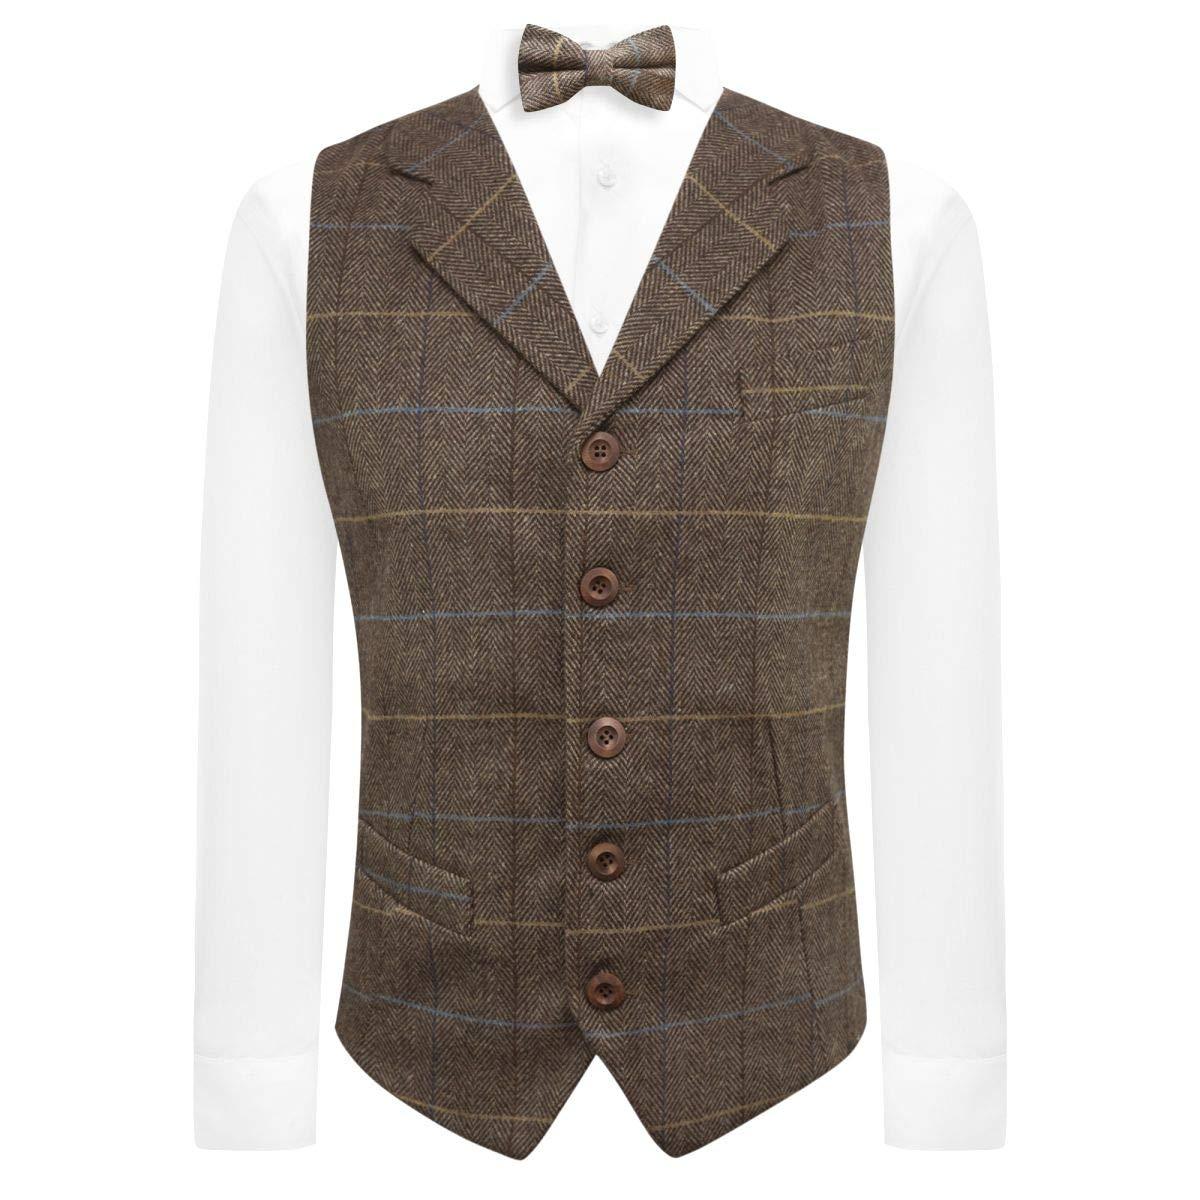 King /& Priory Walnut Brown Herringbone Check Waistcoat with Lapel Tweed